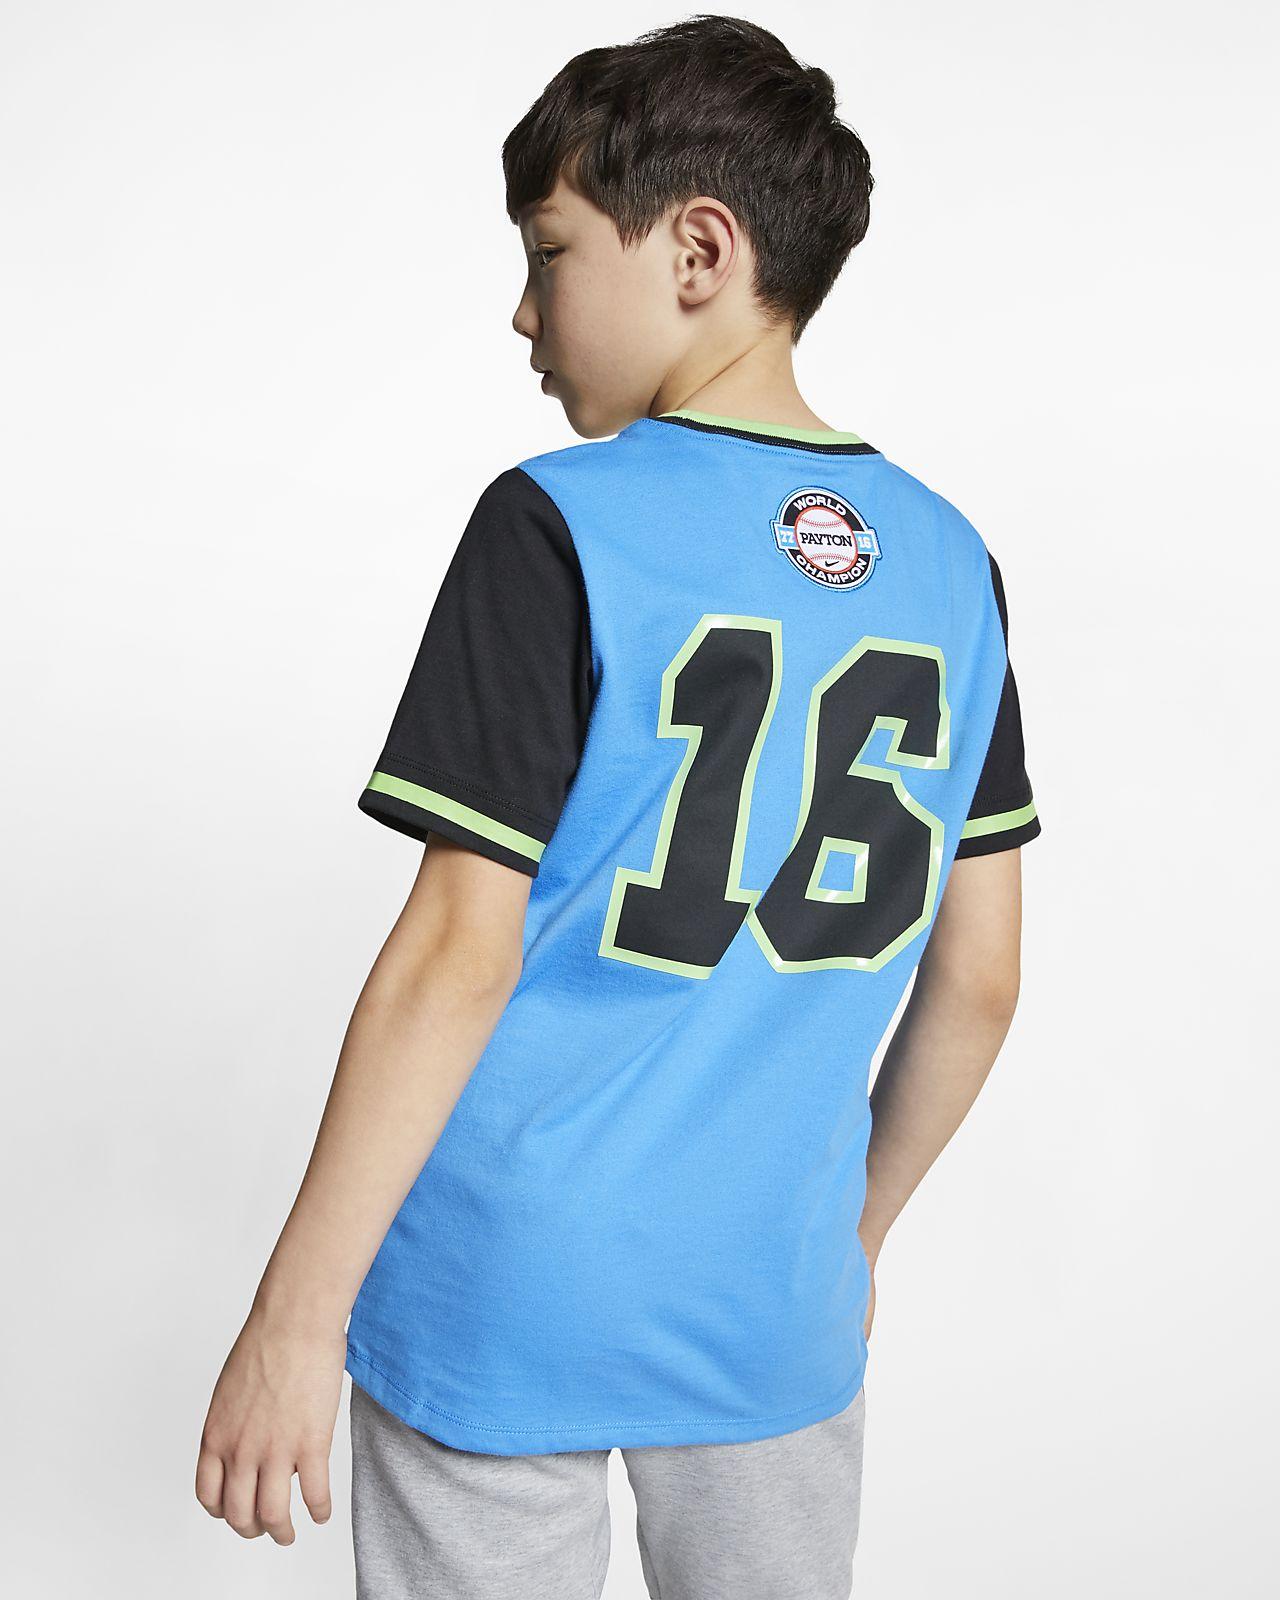 76a36096a5064 ... Payton s Nike (Doernbecher Freestyle) Big Kids  (Boys ) T-Shirt. Low  Resolution ...